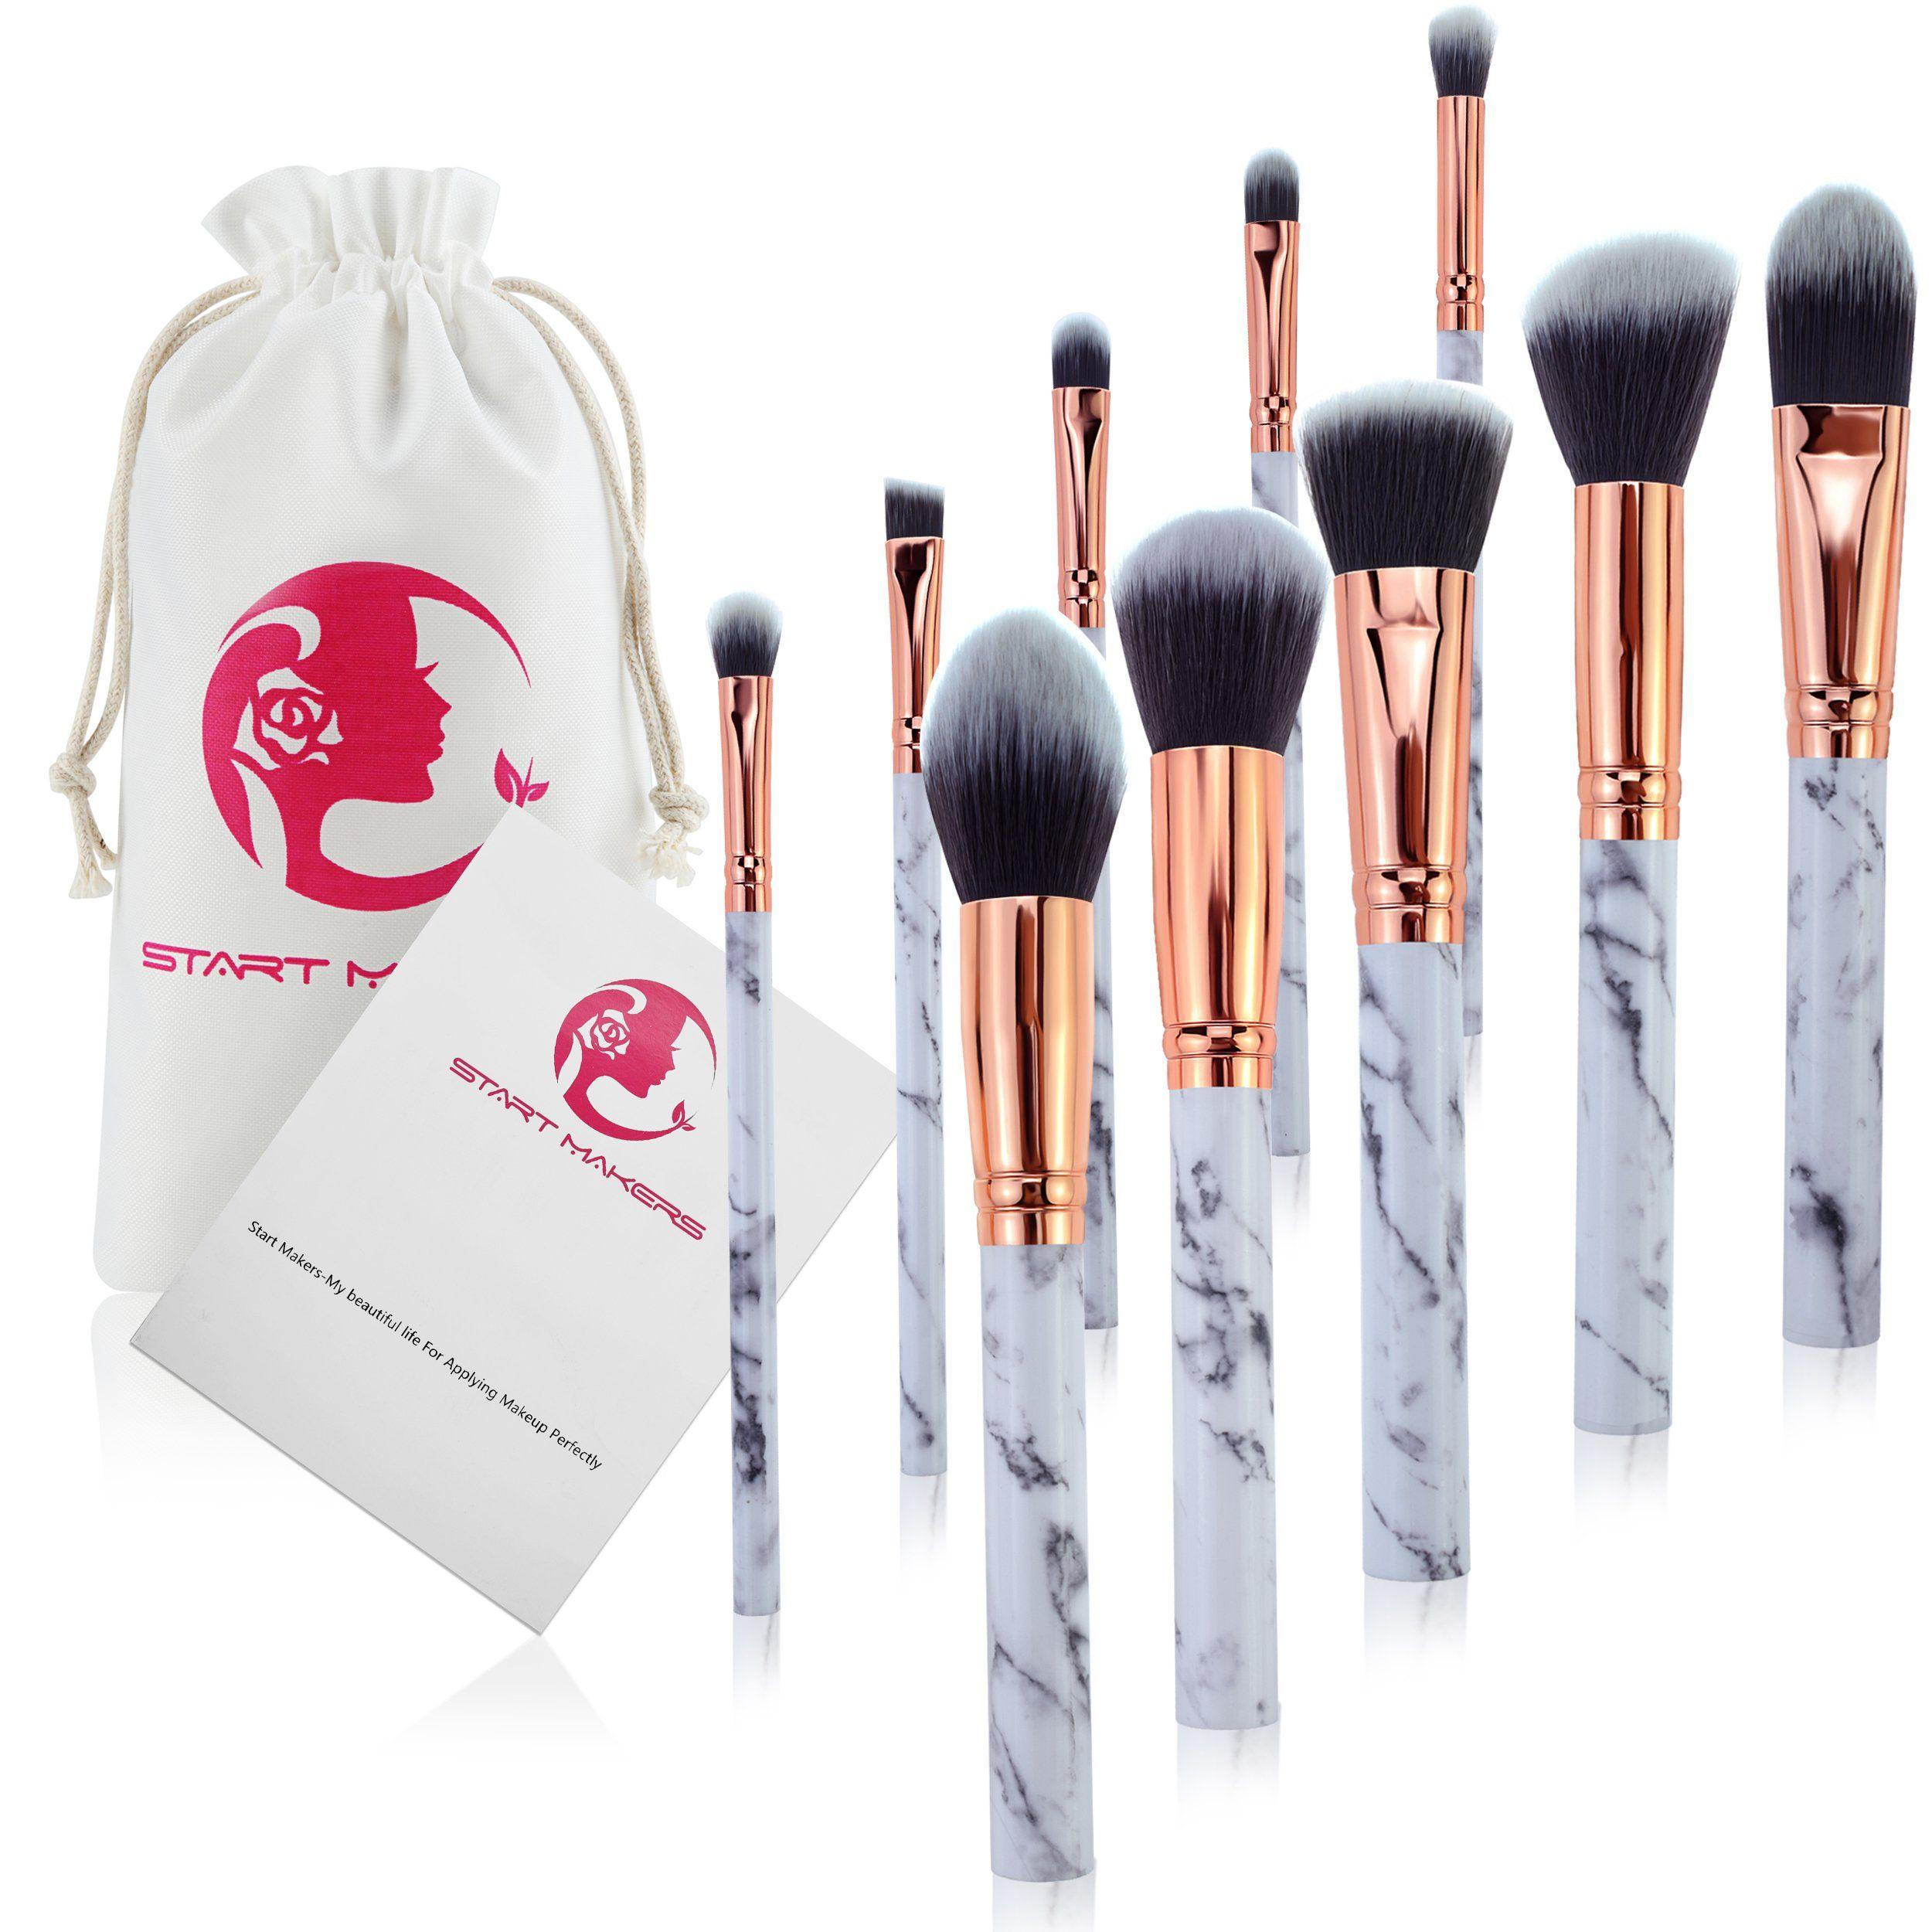 Makeup Brushes Start Makers 10 Pieces Marble Make Up Brushes Set Powder Blush Foundation Eye Shadow Eyebrow Bru Makeup Brush Set Eyebrow Brush Makeup Brushes